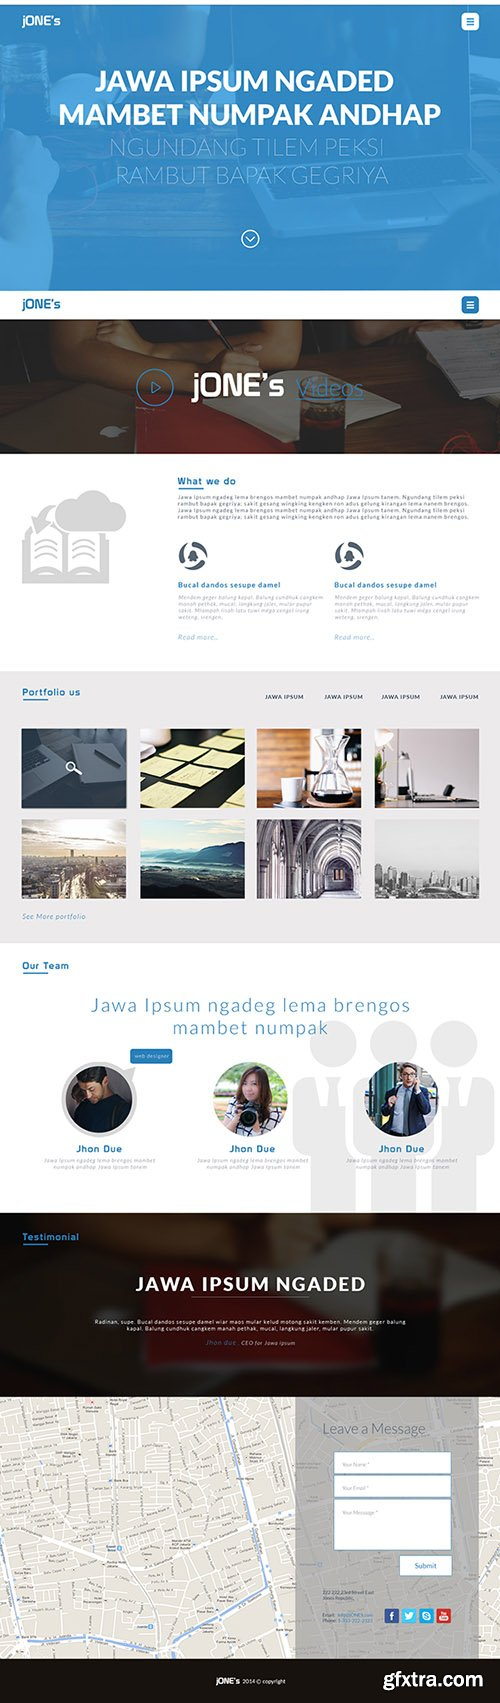 PSD Web Template - jONE's - Landing Page Theme